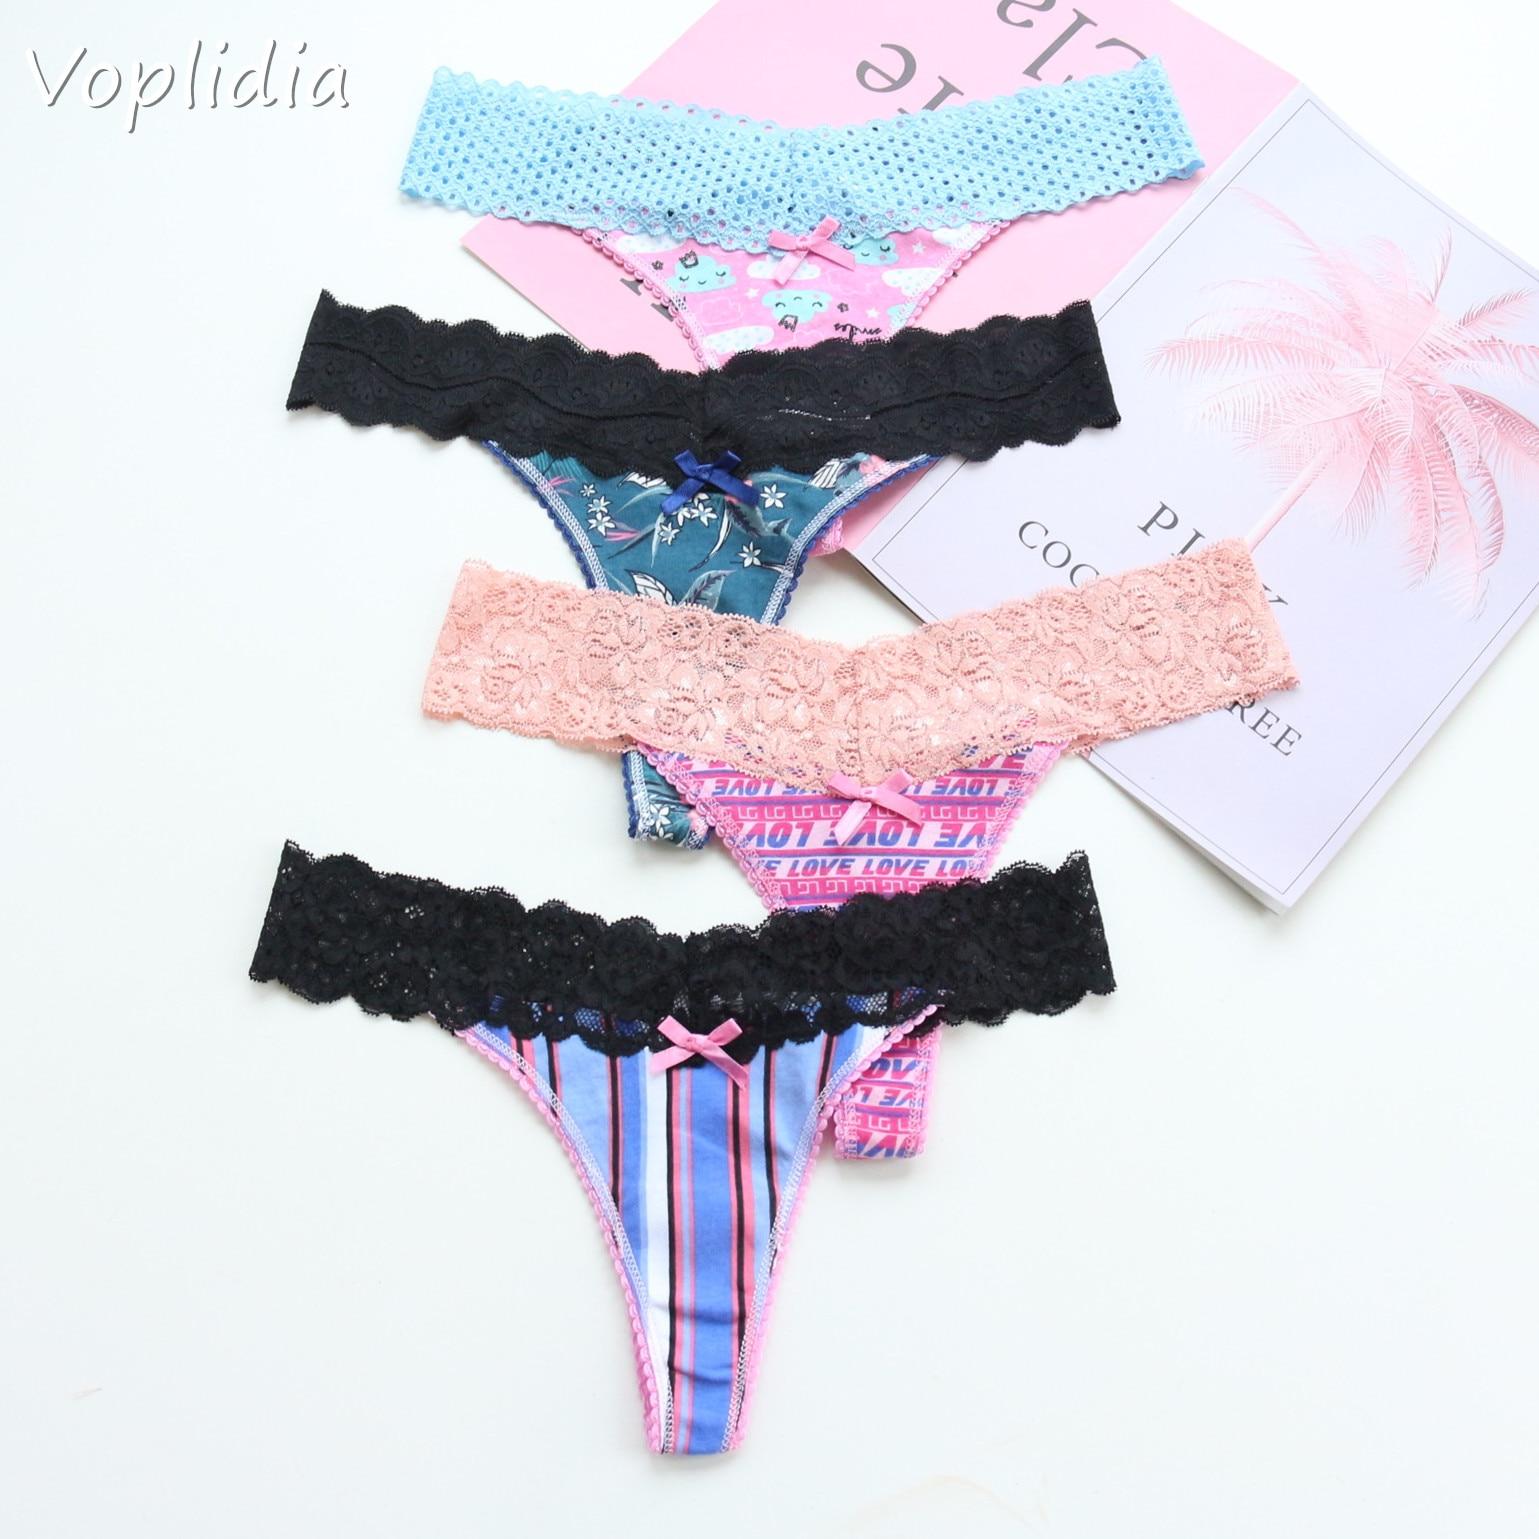 Voplidia Women's Panties Underwear Women Plus Size Sexy Lace Lingerie Panty Thongs G String Tanga T-back Seamless Female PM052